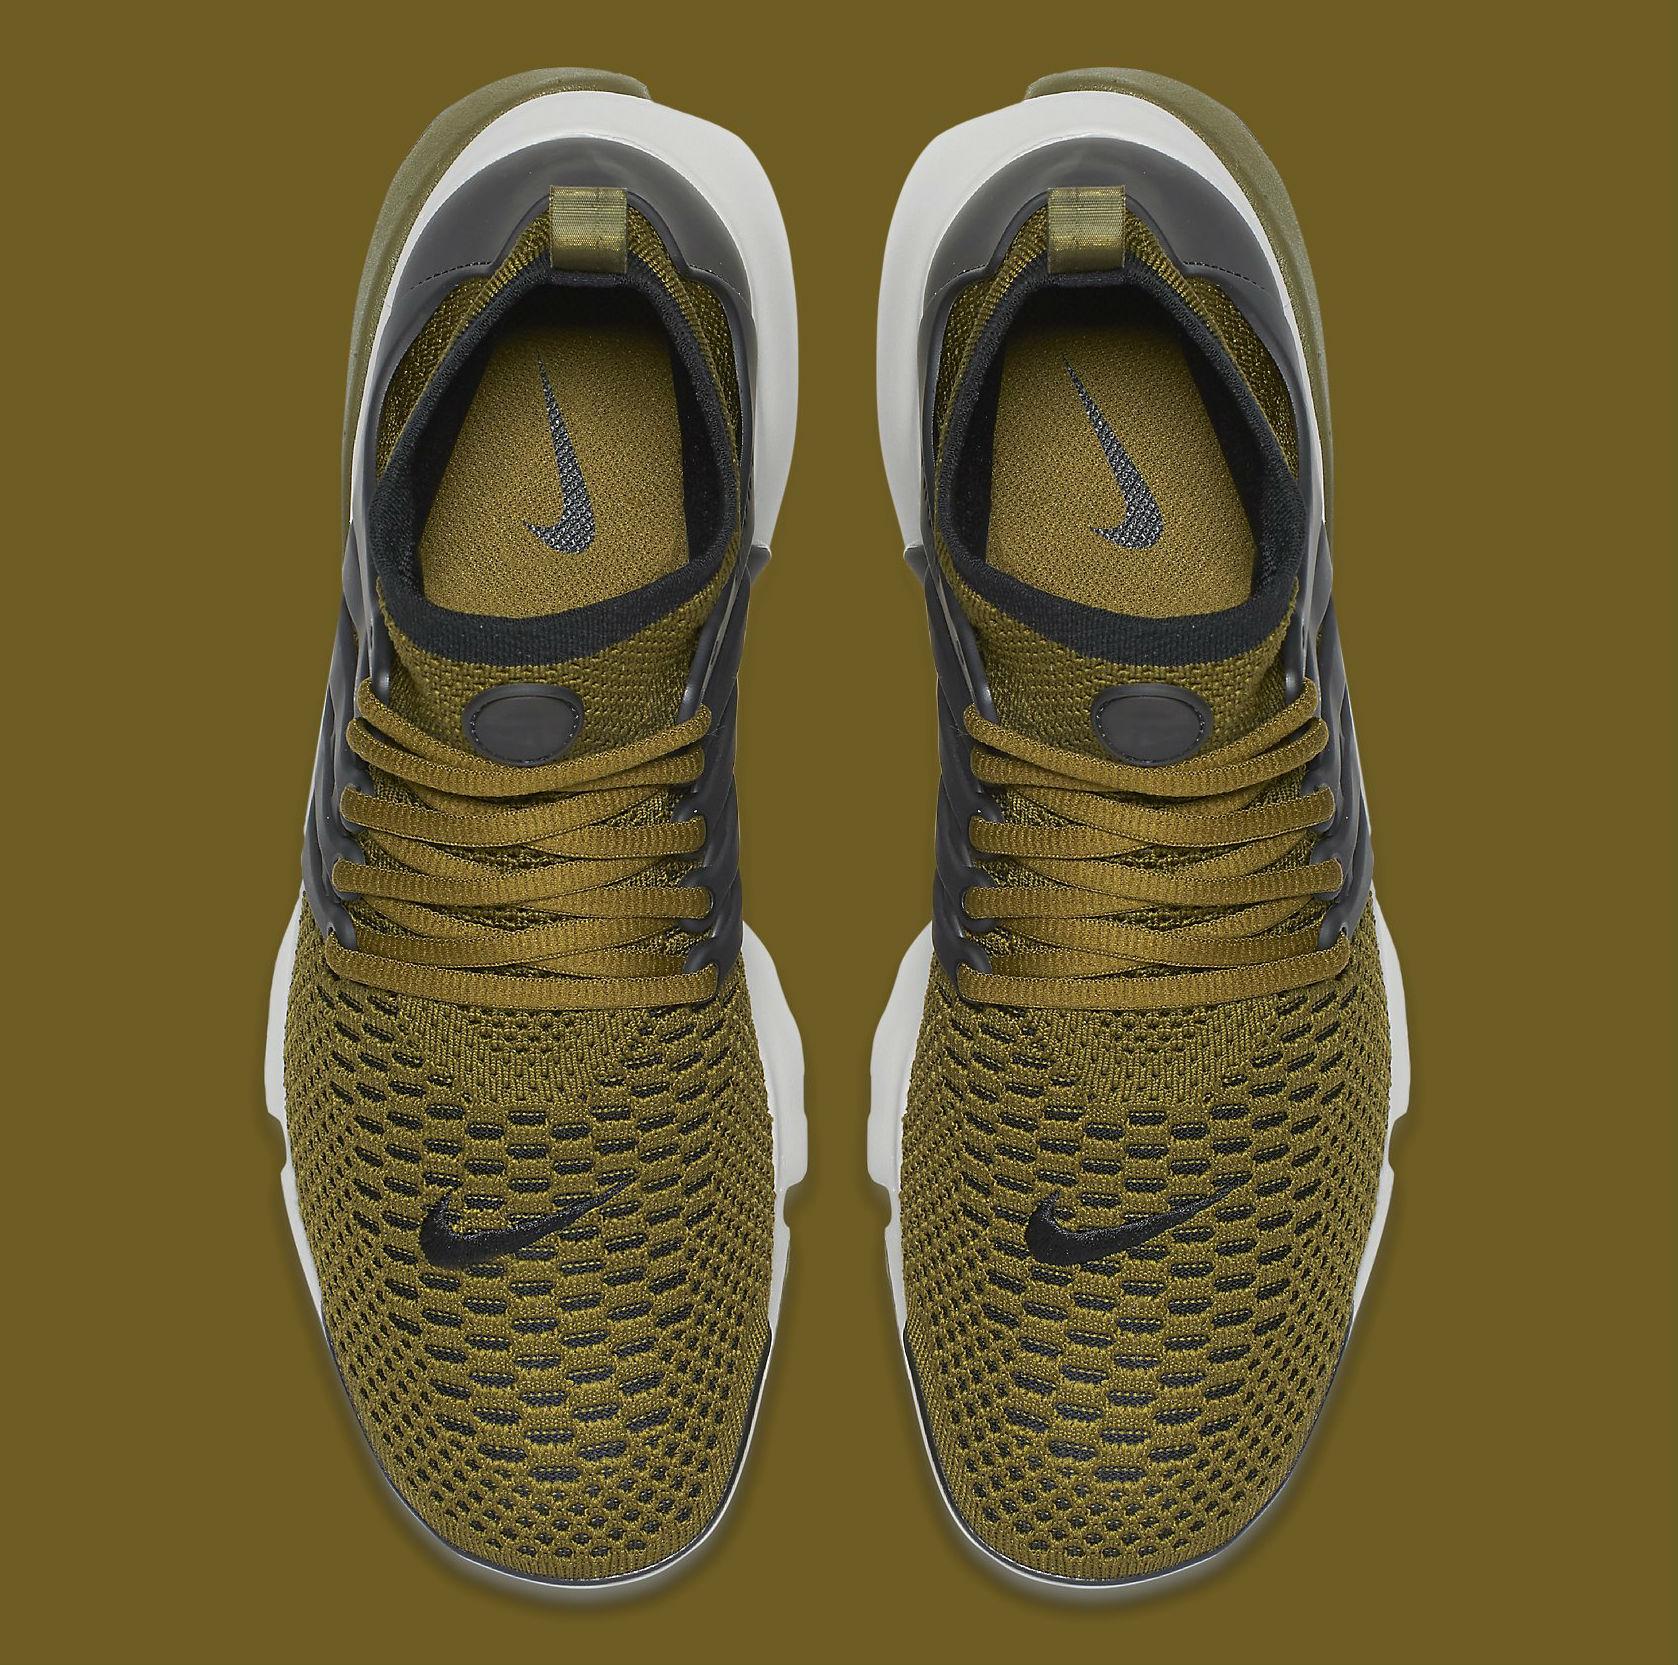 Nike Air Presto Ultra Flyknit Olive Flak Top 835570-300